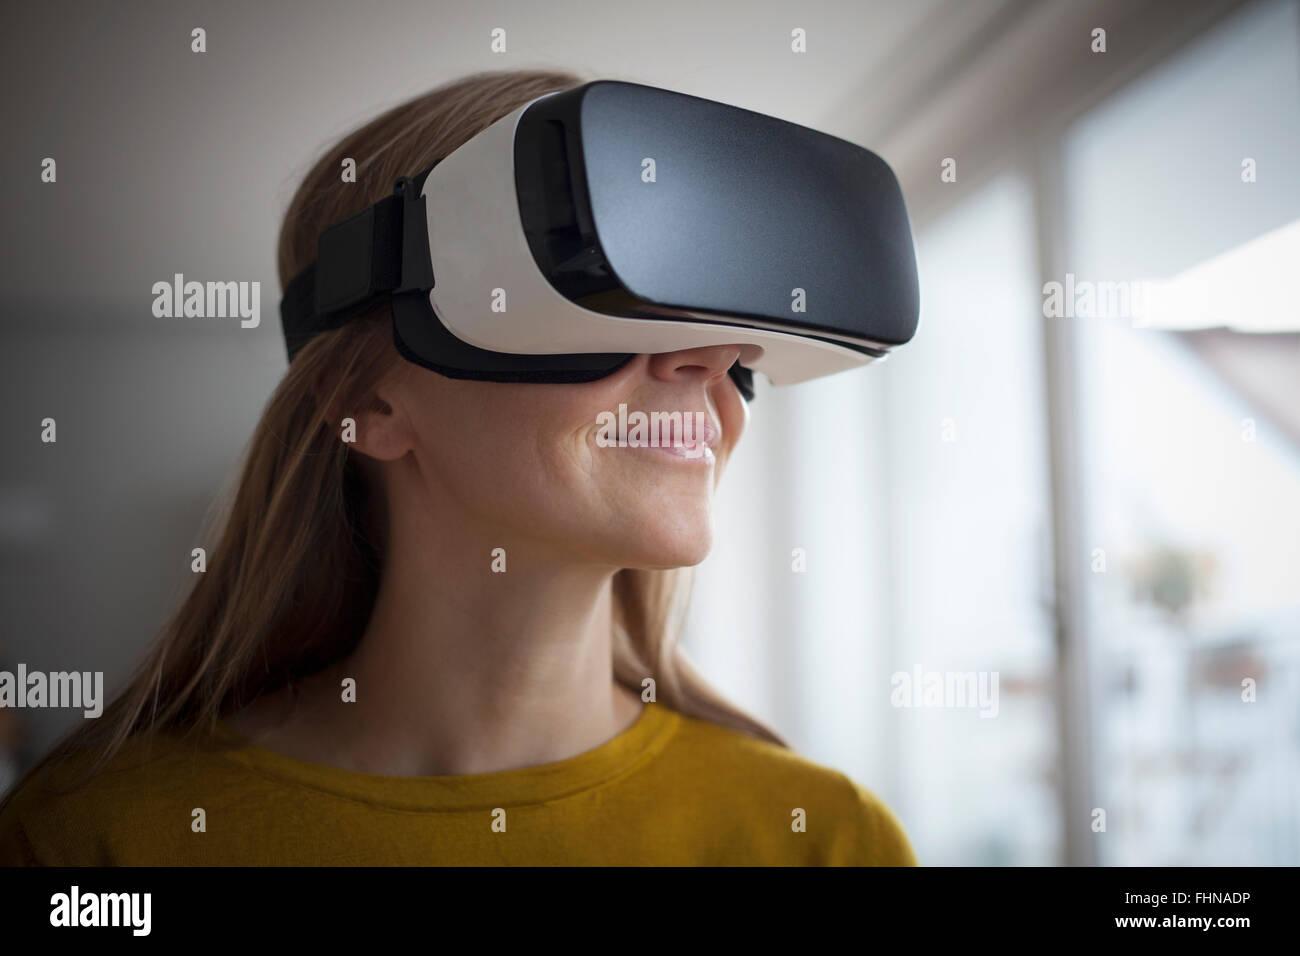 Smiling woman wearing Virtual Reality Glasses - Stock Image